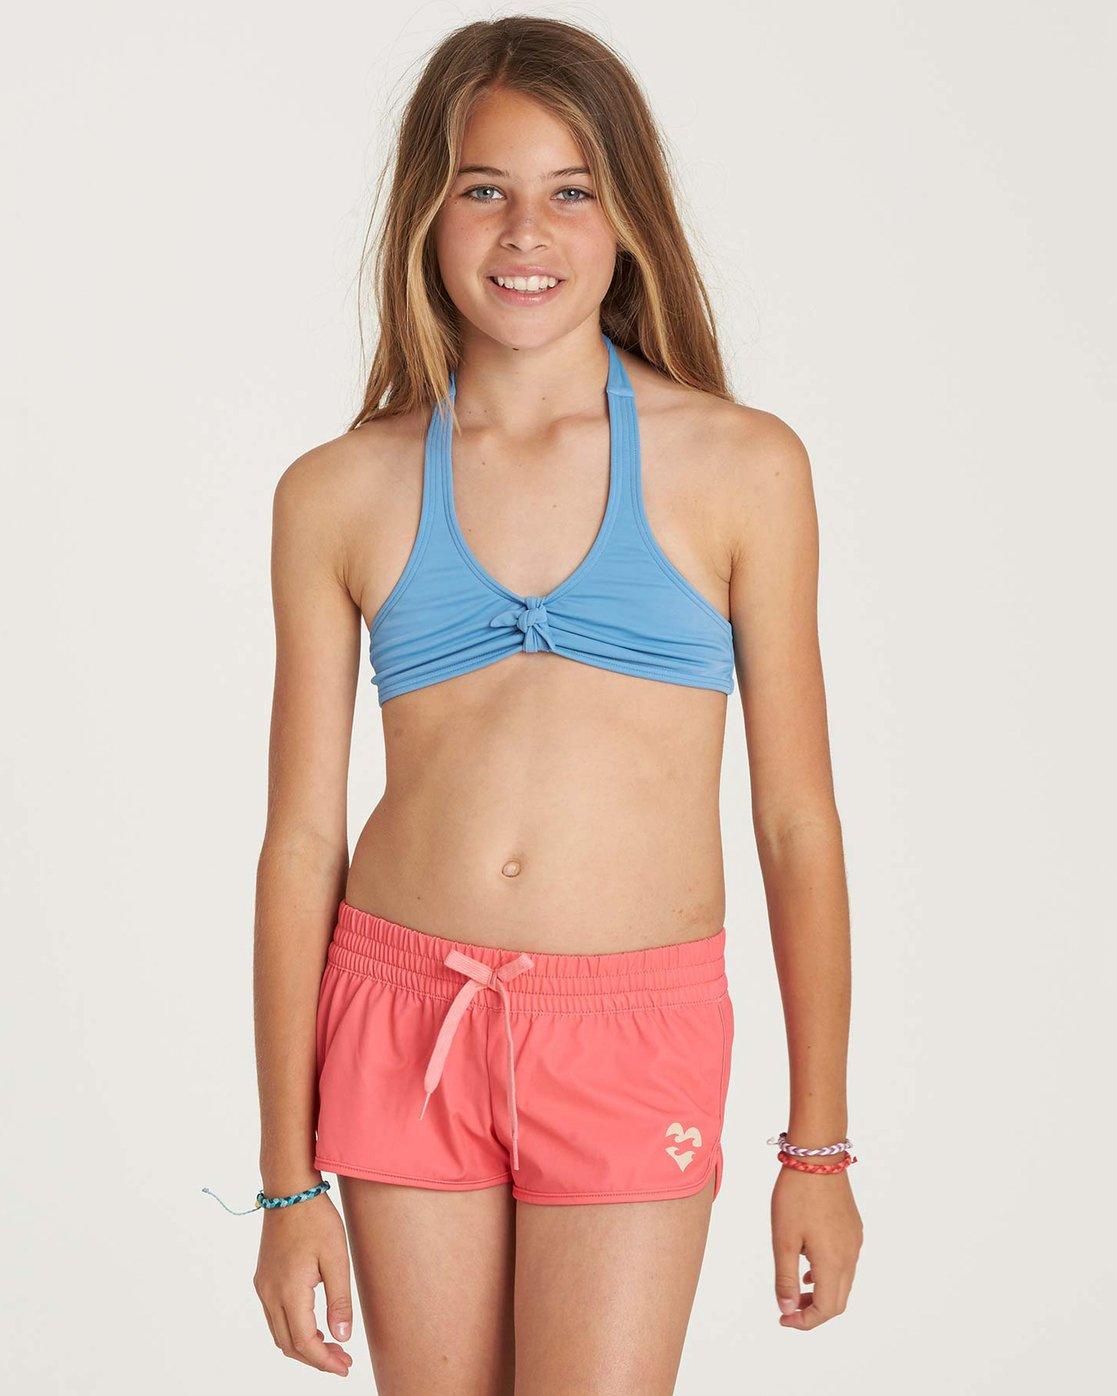 bikini-junior-girl-photos-upskirt-dancing-pics